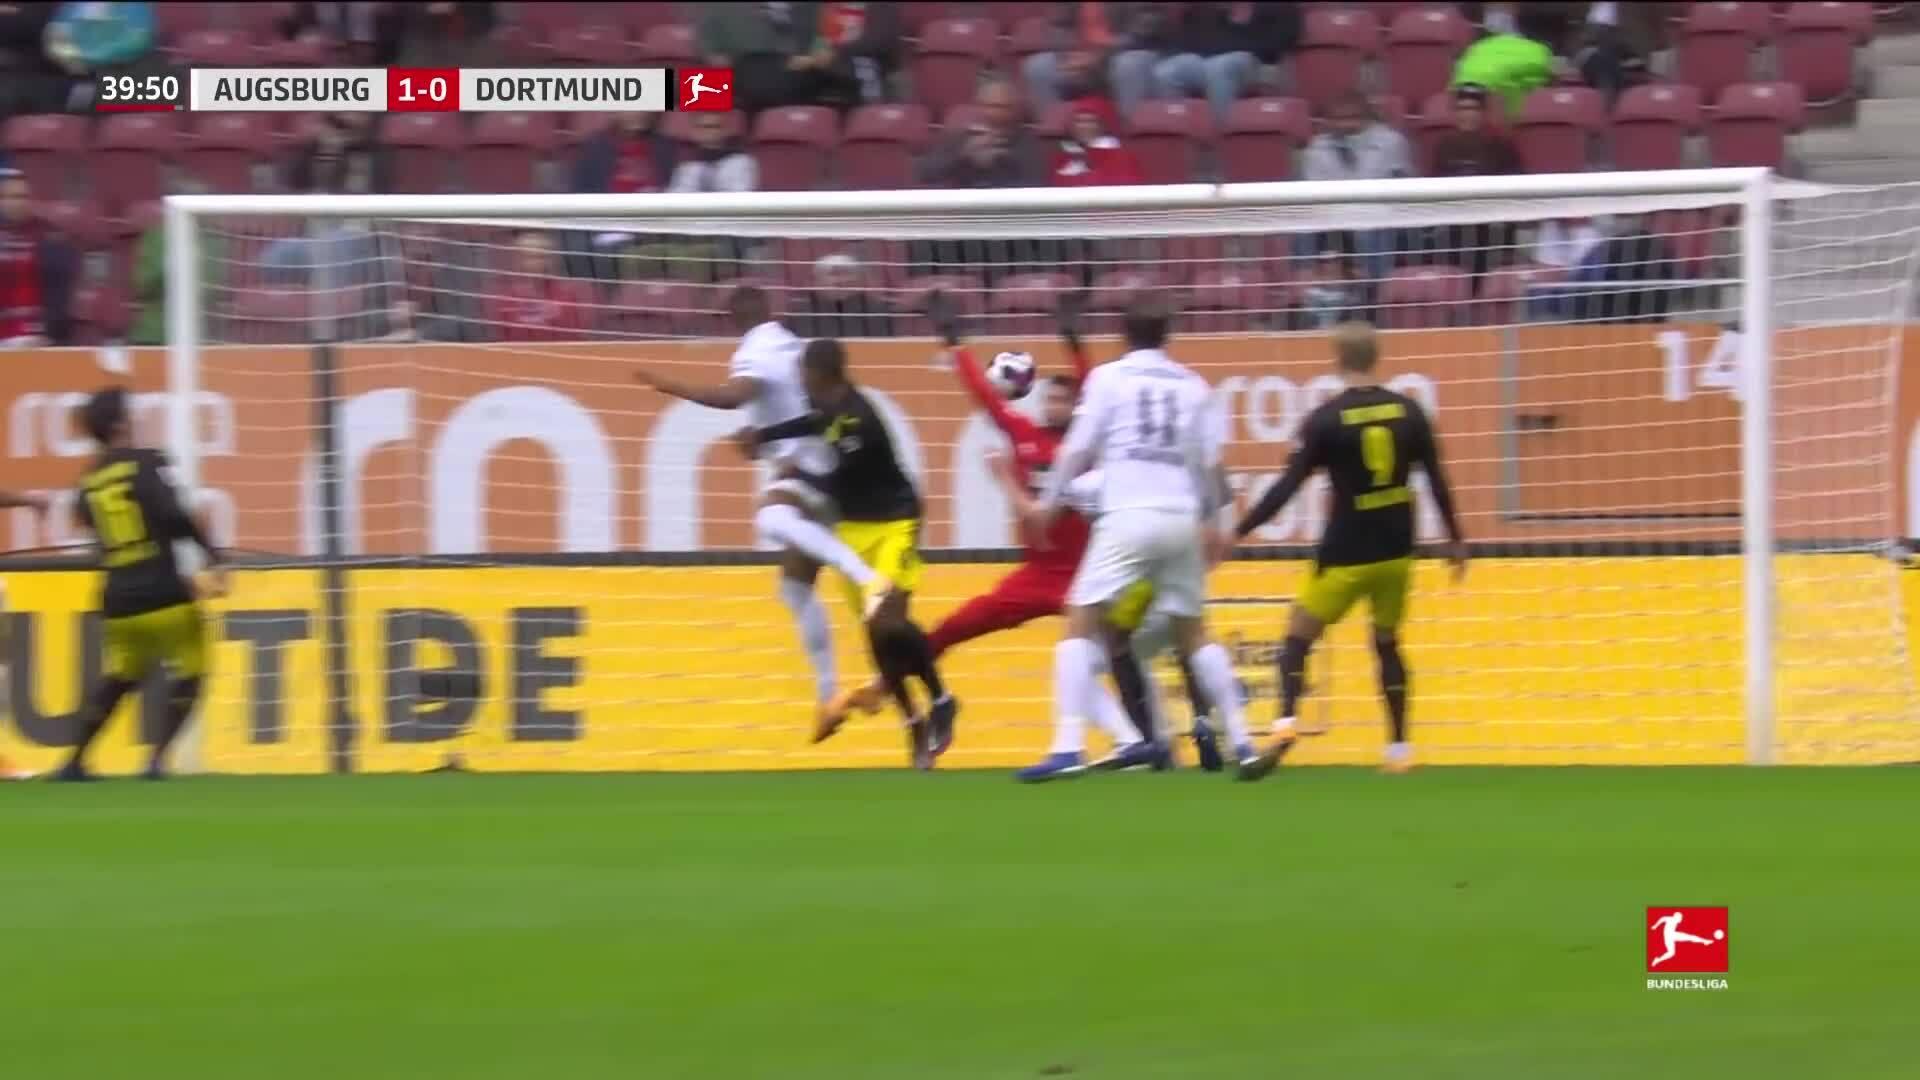 Augsburg 2-0 Dortmund